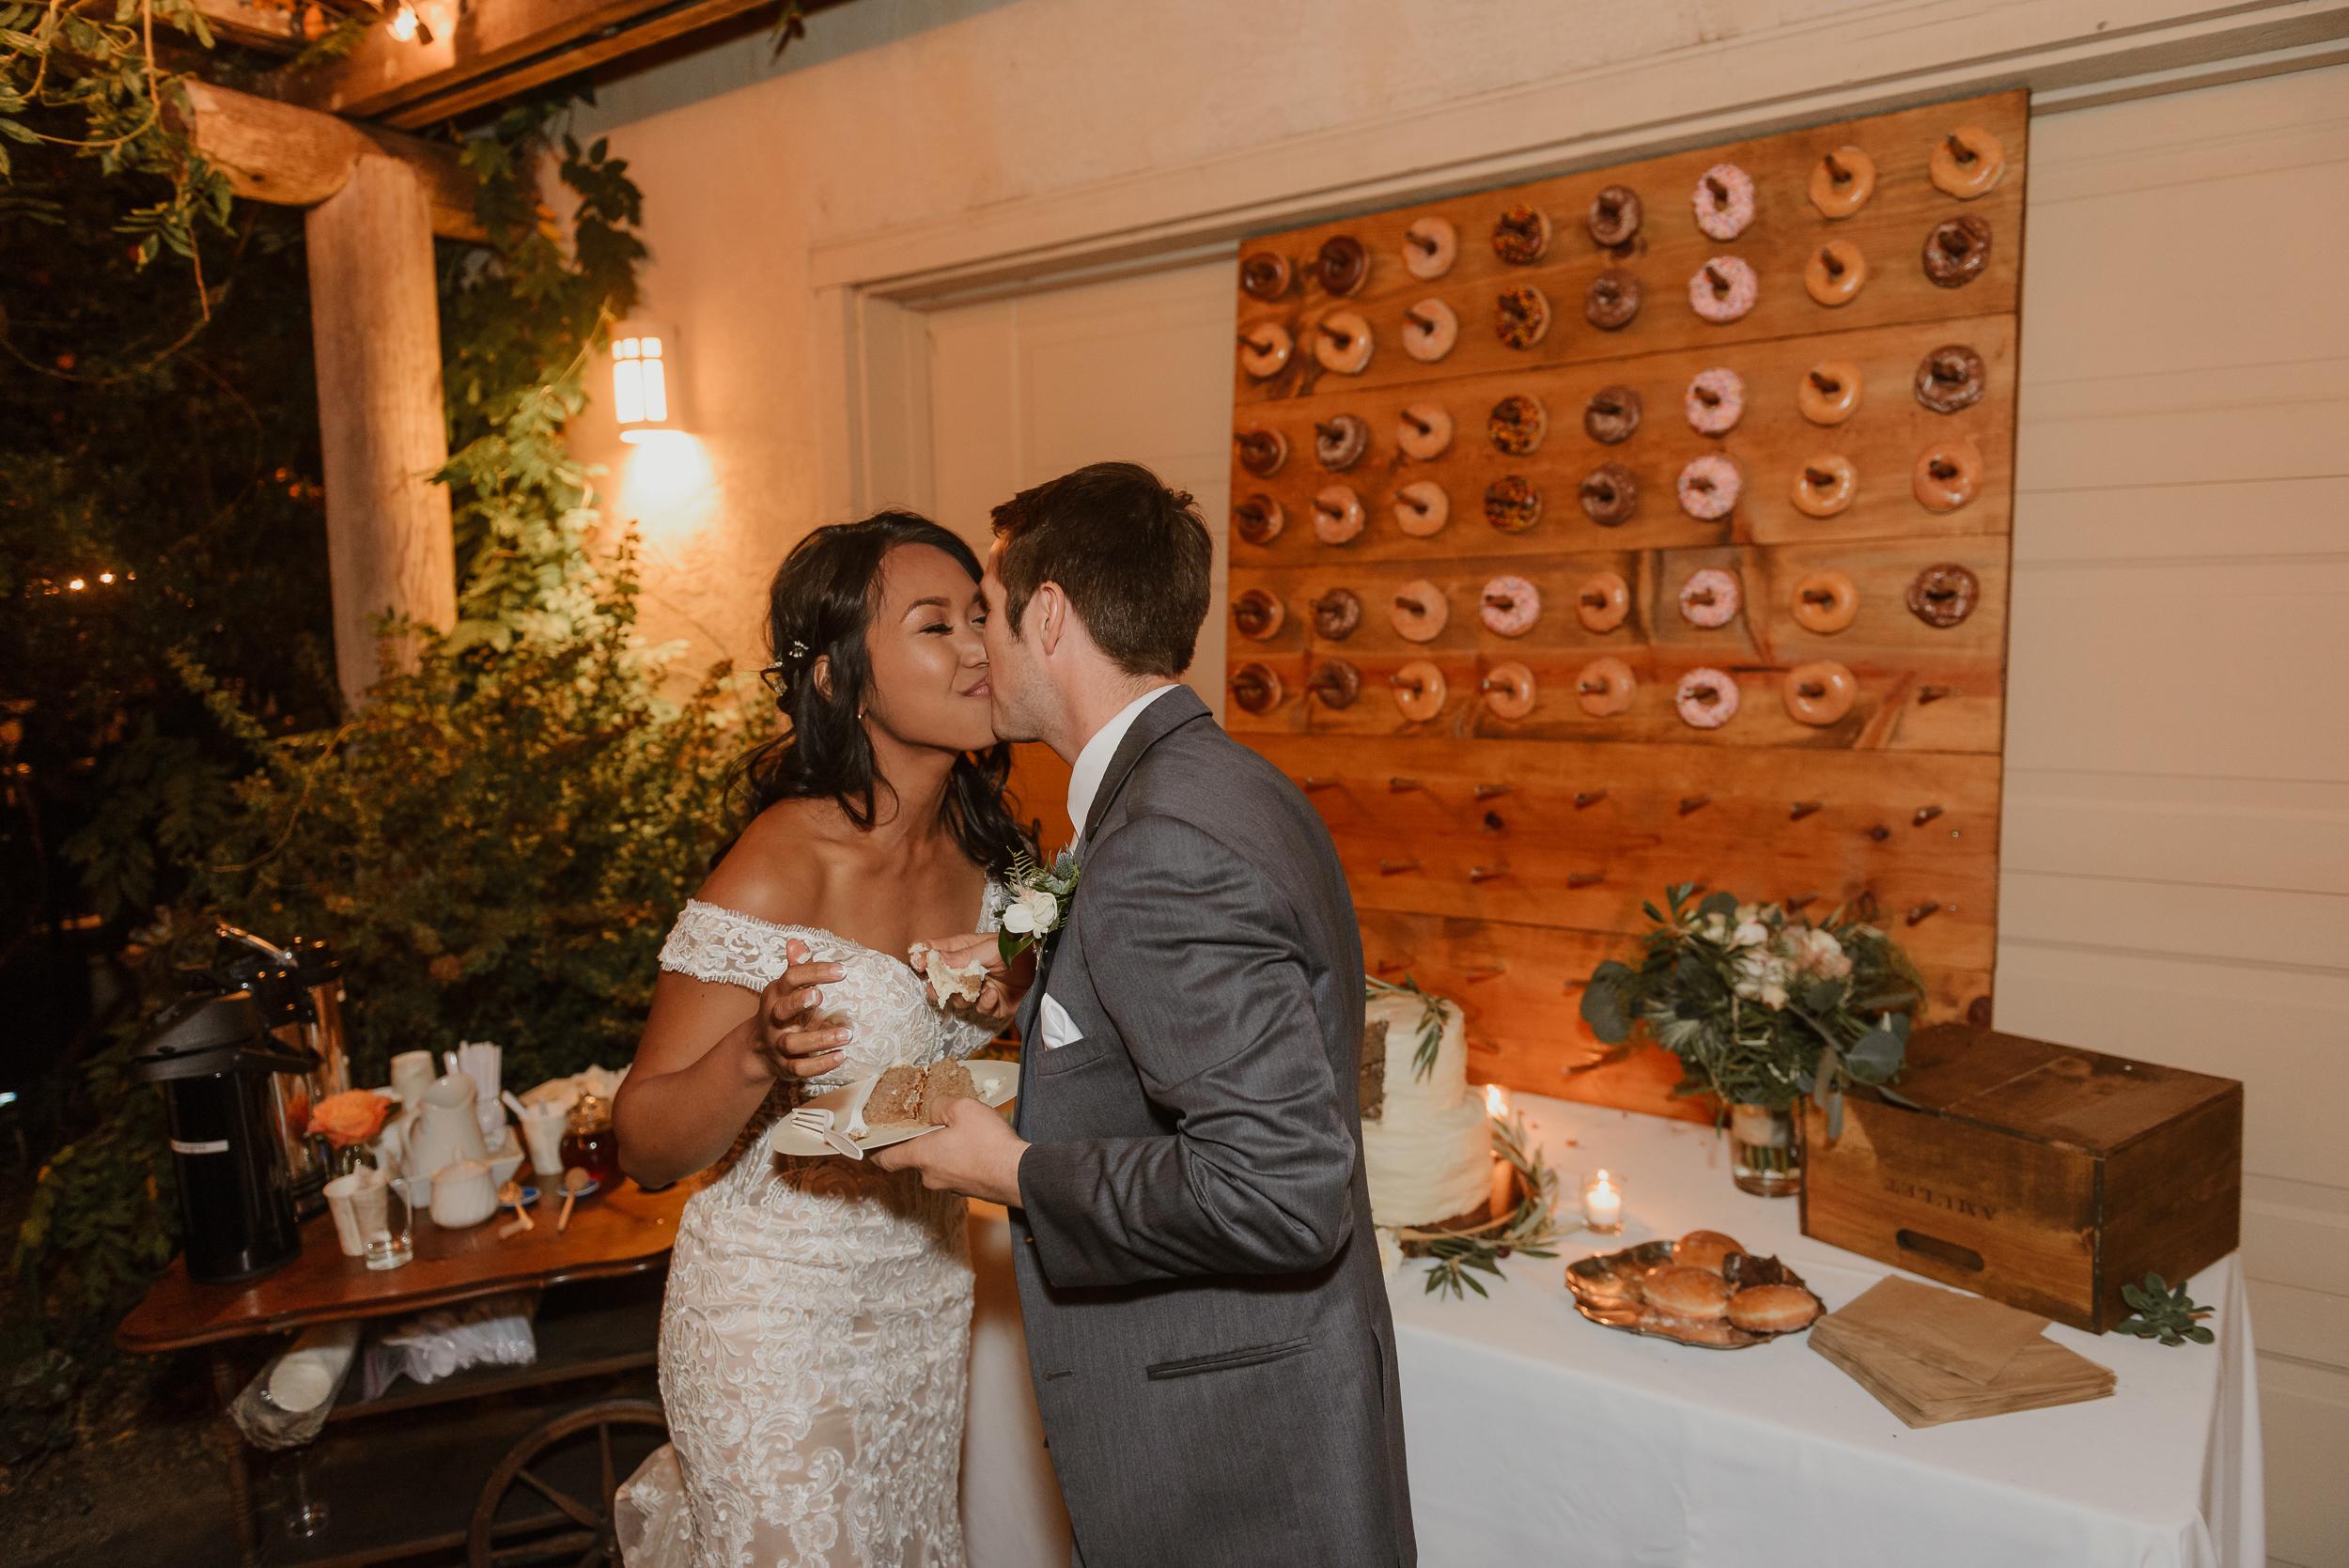 103marin-petaluma-backyard-wedding-vivianchen-621.jpg